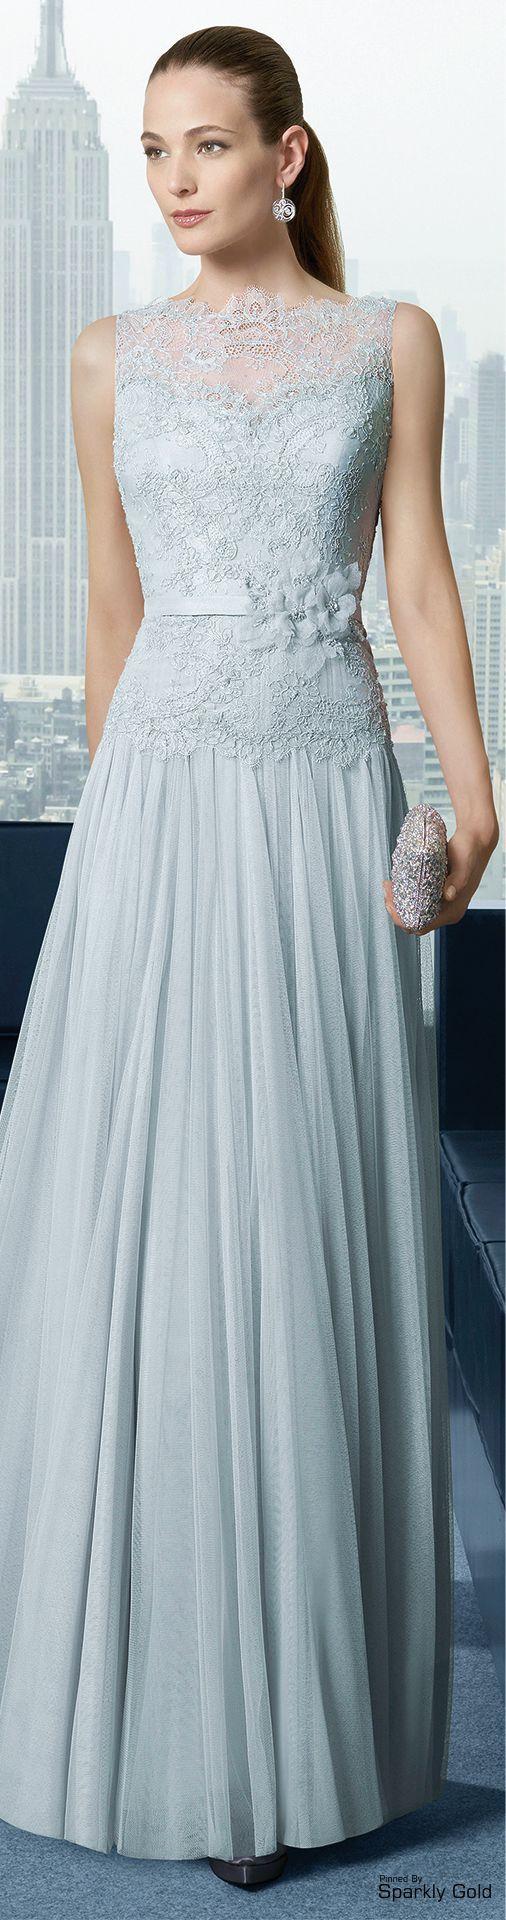 Mejores 395 imágenes de Party Dresses en Pinterest | Vestidos ...